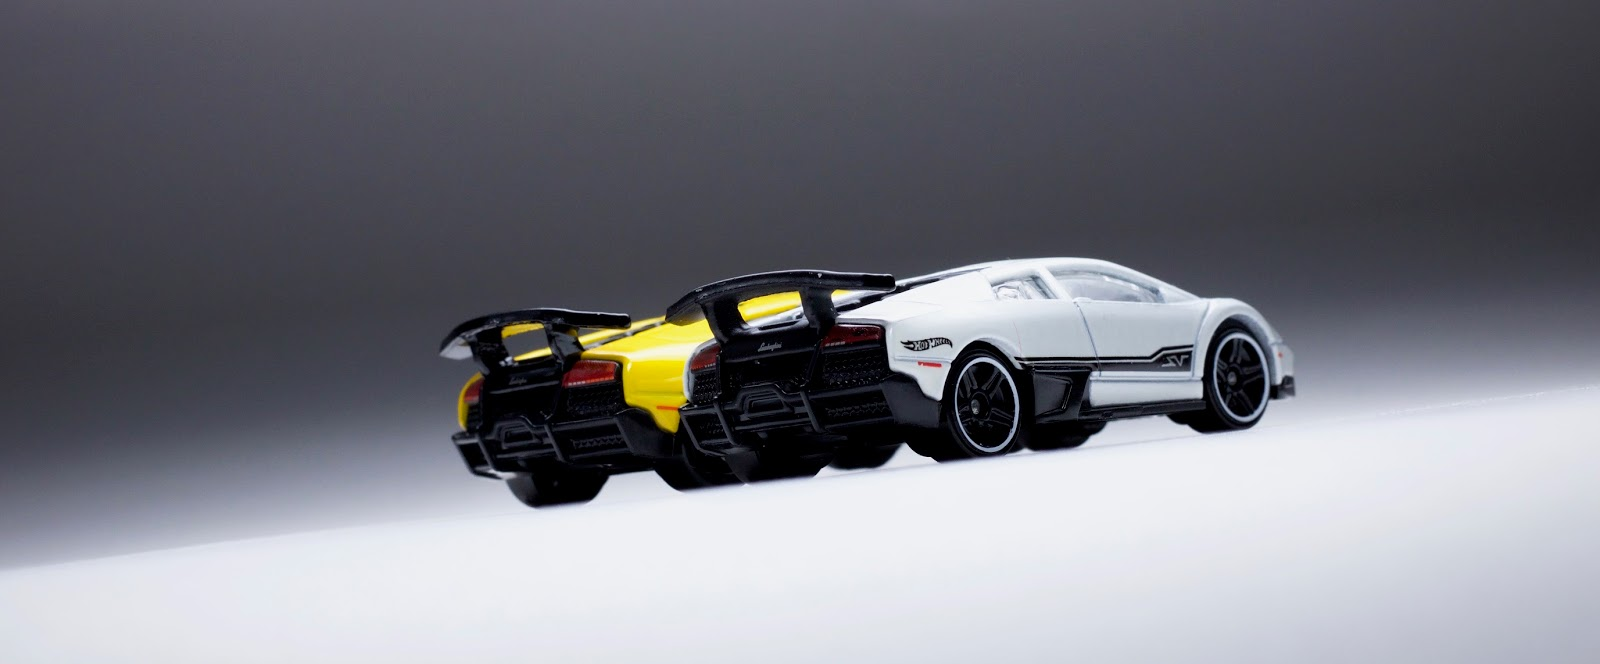 Whatever Happened To The Hot Wheels Lamborghini Murcielago Lp 670 4